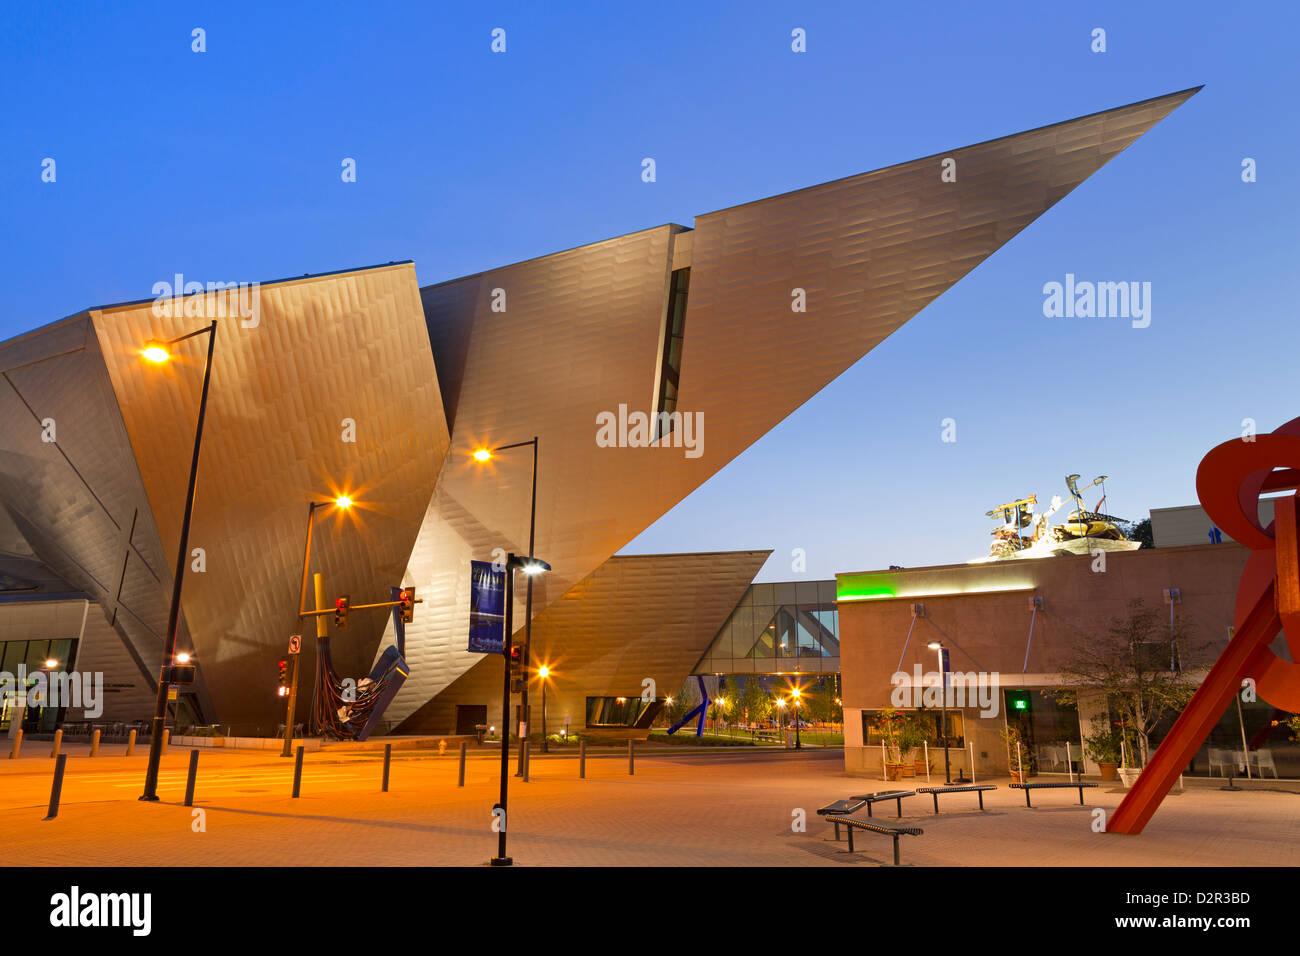 Denver Art Museum, Denver, Colorado, United States of America, North America - Stock Image